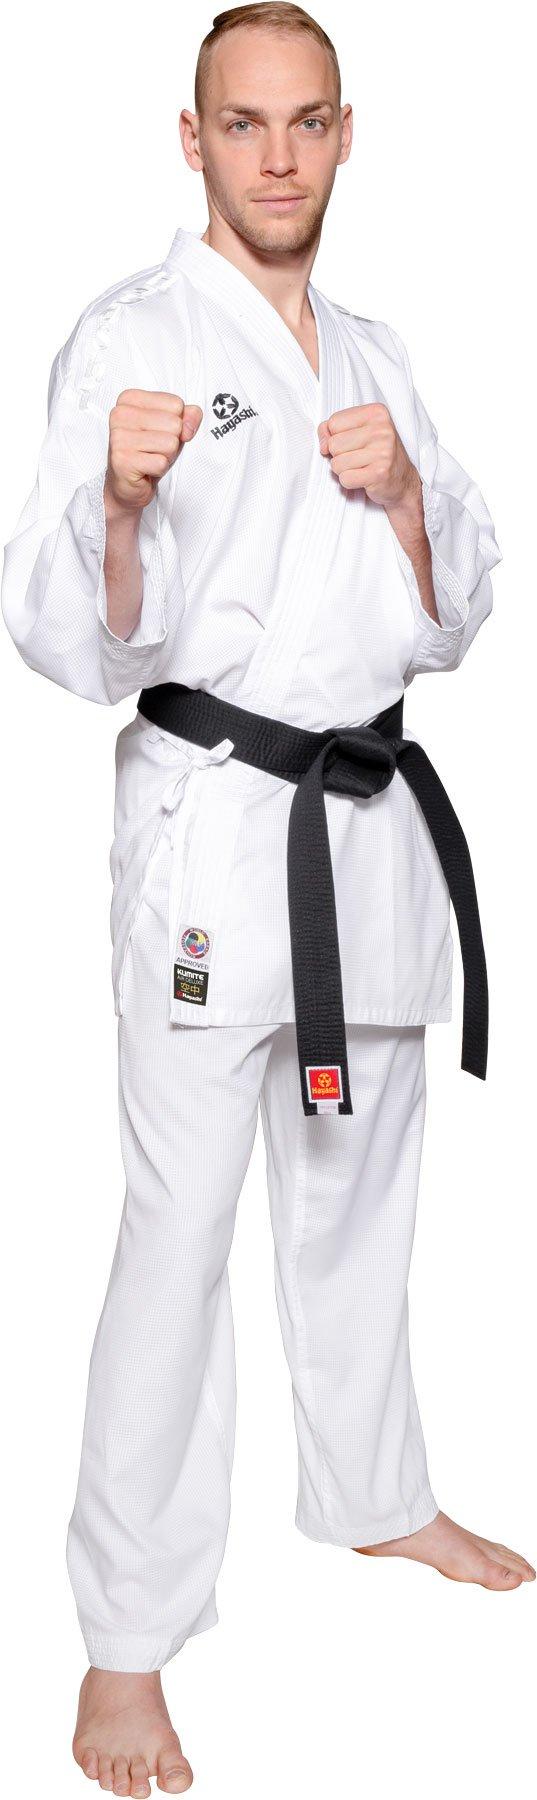 "Hayashi Karatepak ""Air Deluxe"" (Wit - Grijs)"